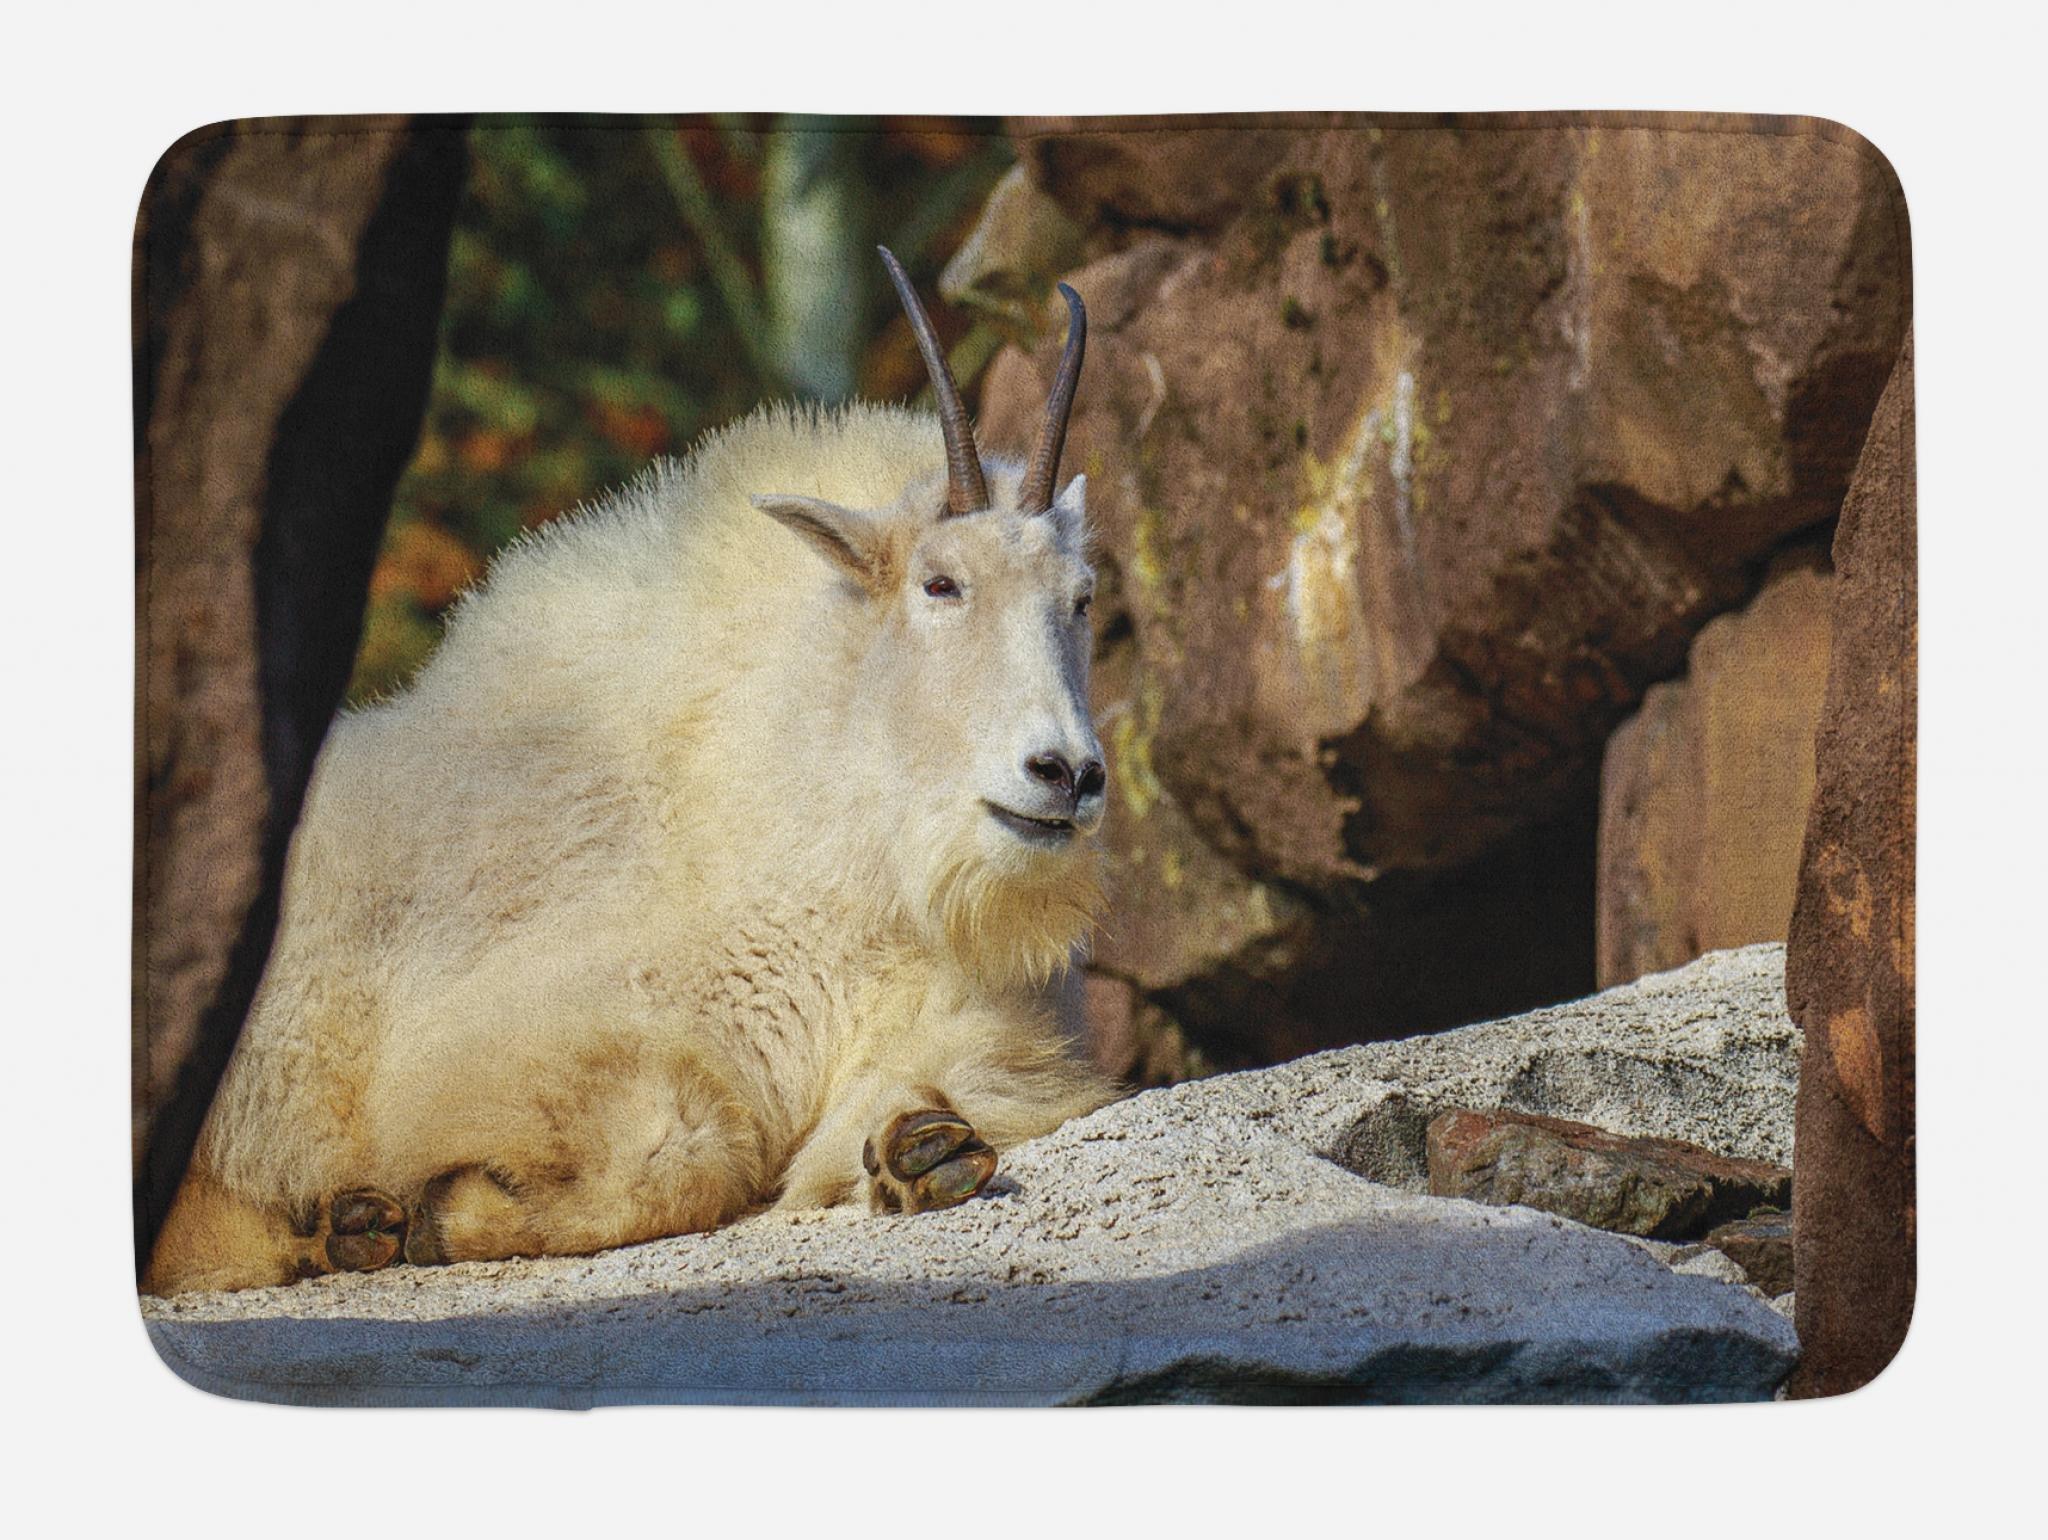 Lunarable Goat Bath Mat, White Mountain Goat Sunbathing on a Rocky Slope Idyllic North America Scene, Plush Bathroom Decor Mat with Non Slip Backing, 29.5 W X 17.5 W Inches, Brown Cream and Grey